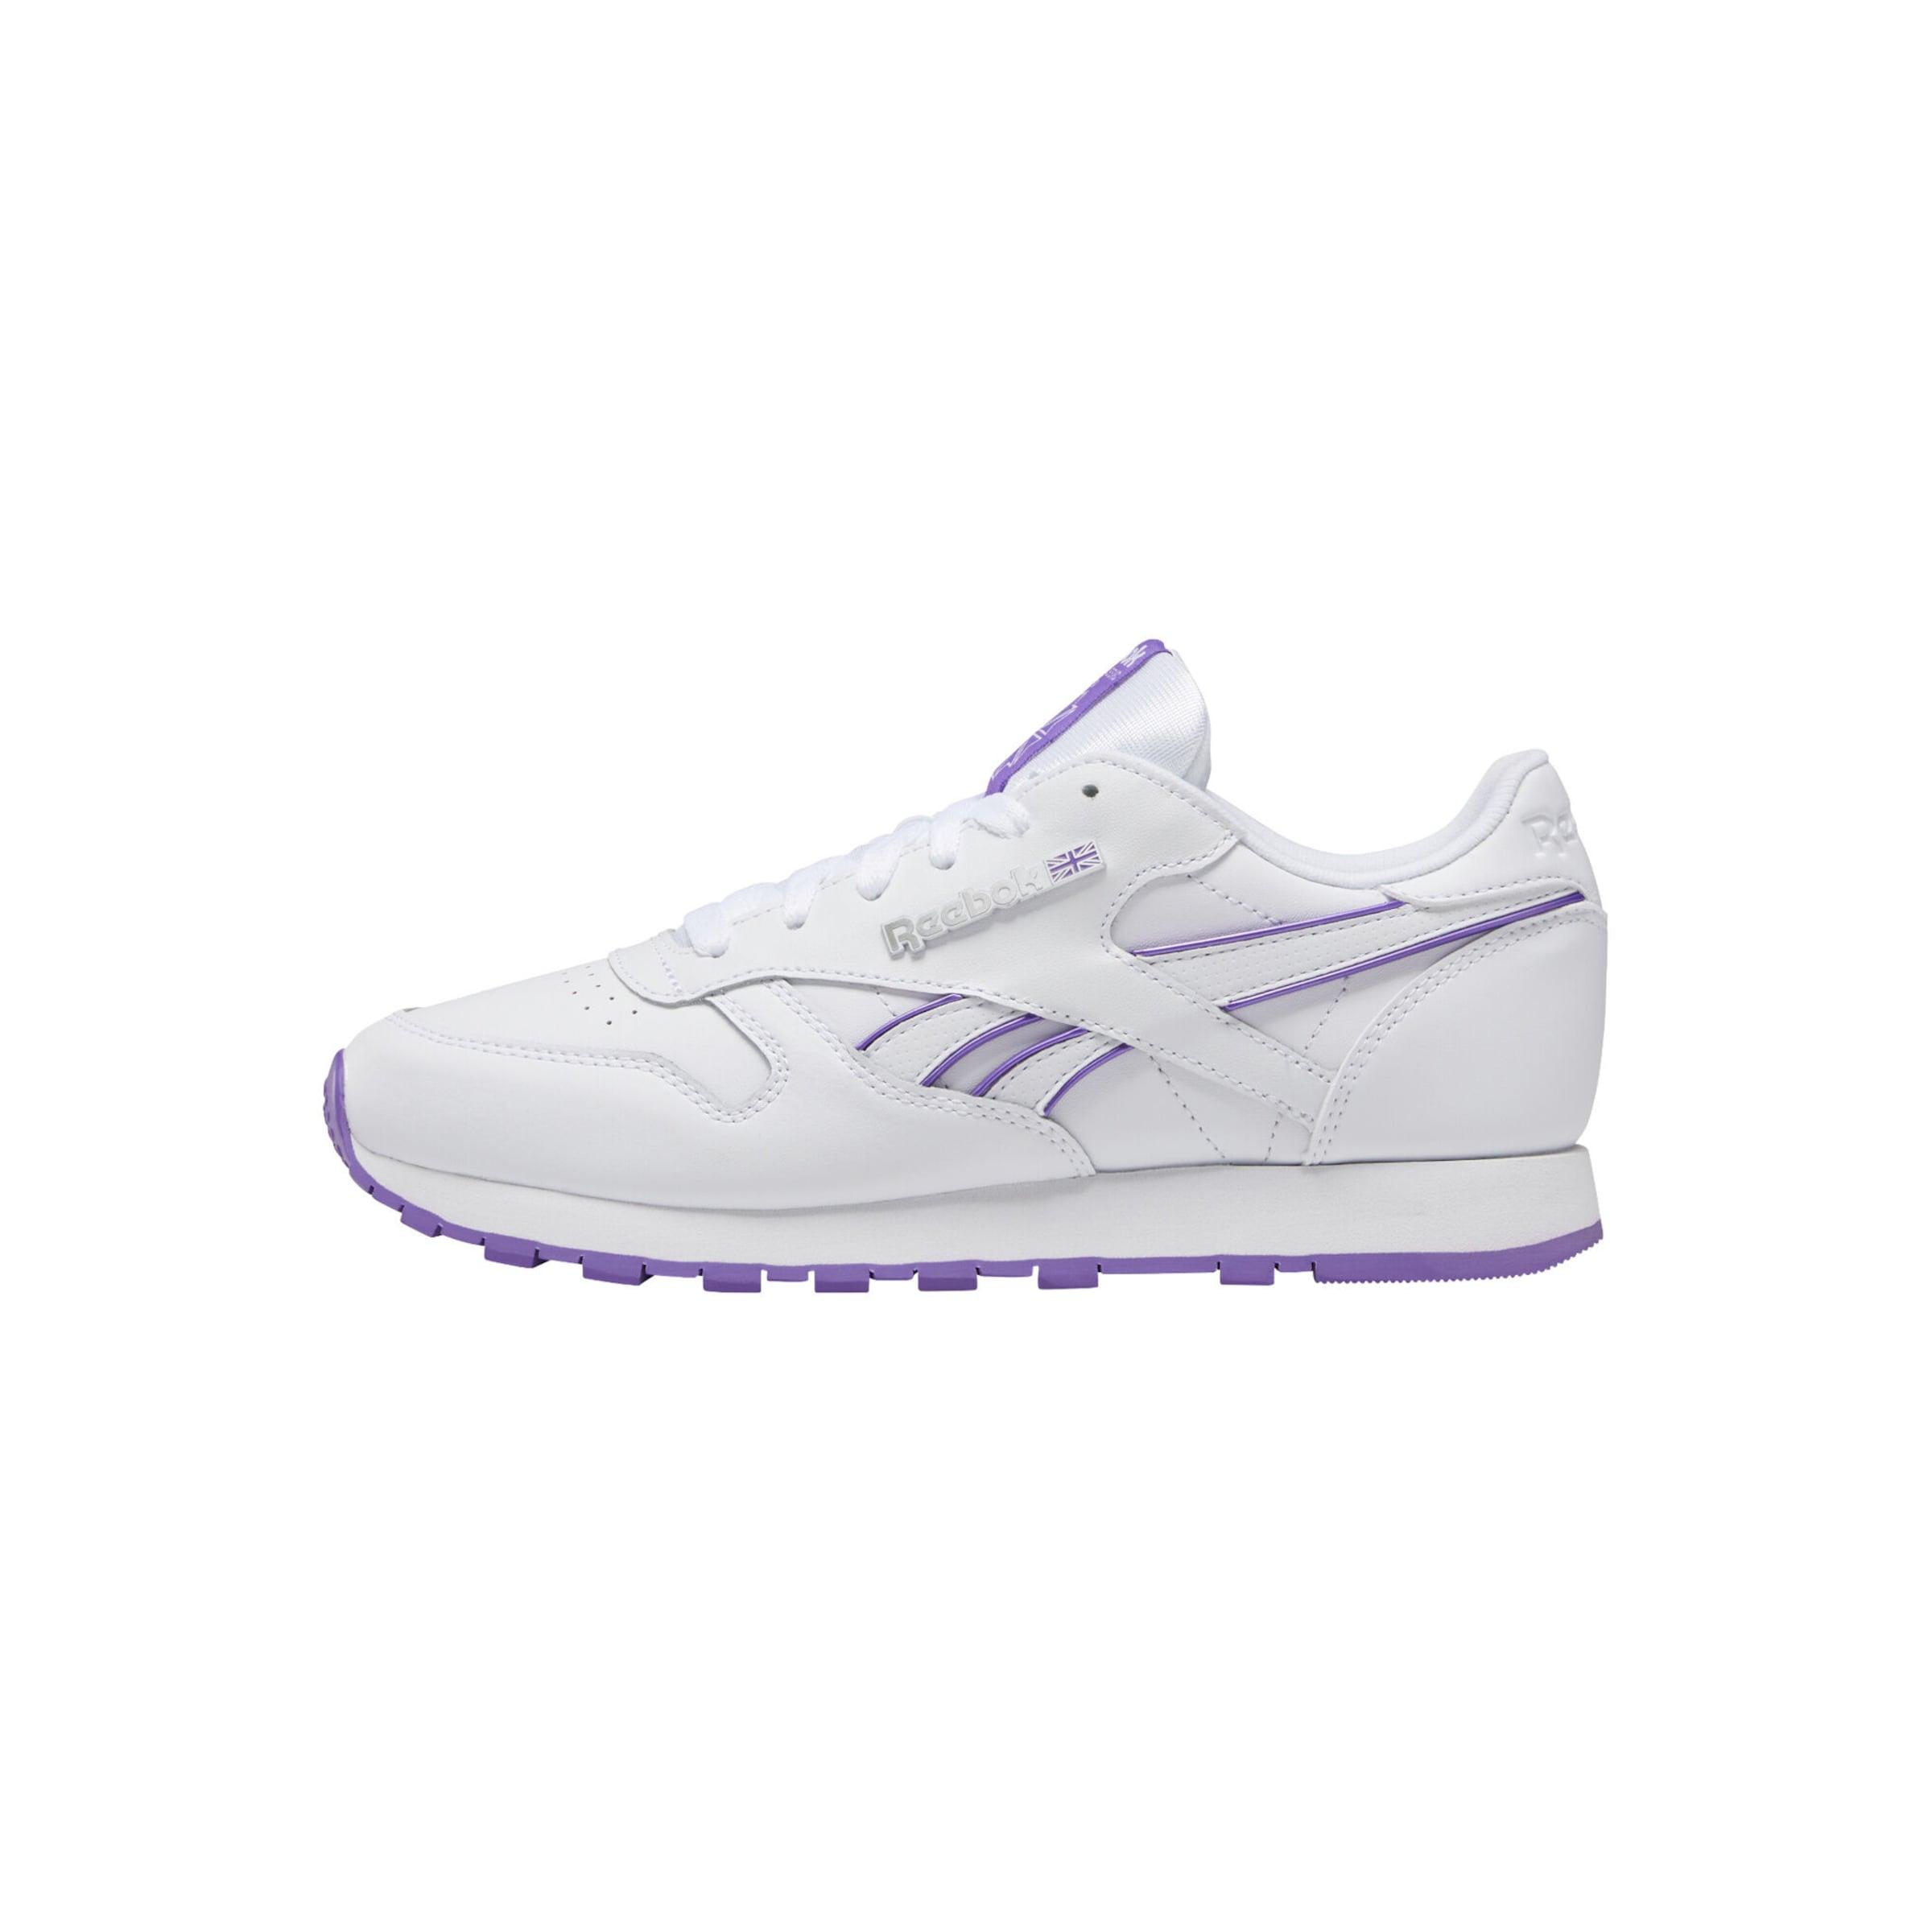 Reebok Classic lila weiß in Turnschuhe 42d74tbqn31599 Schuhe